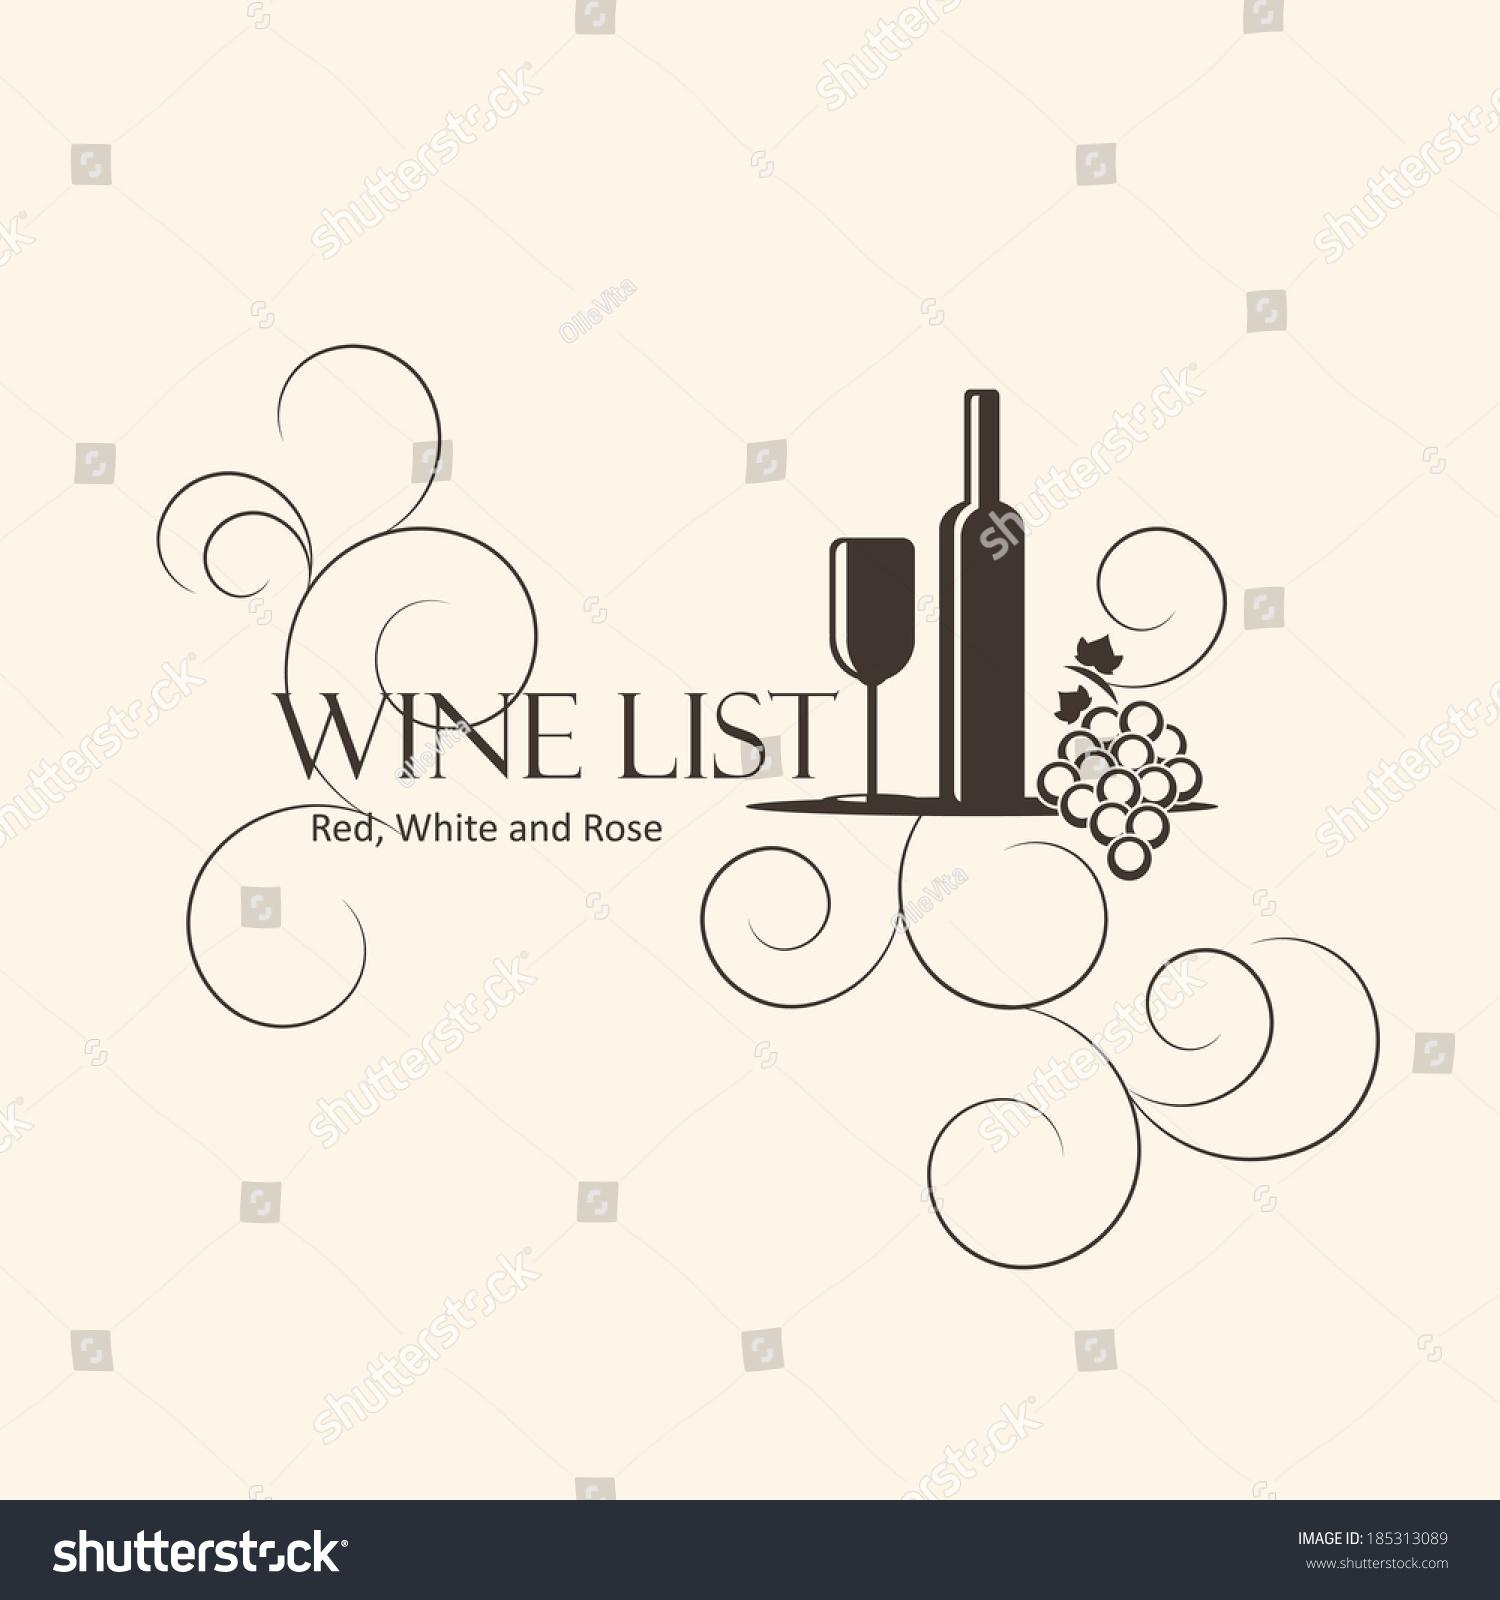 wine list design template stock vector 185313089 shutterstock. Black Bedroom Furniture Sets. Home Design Ideas